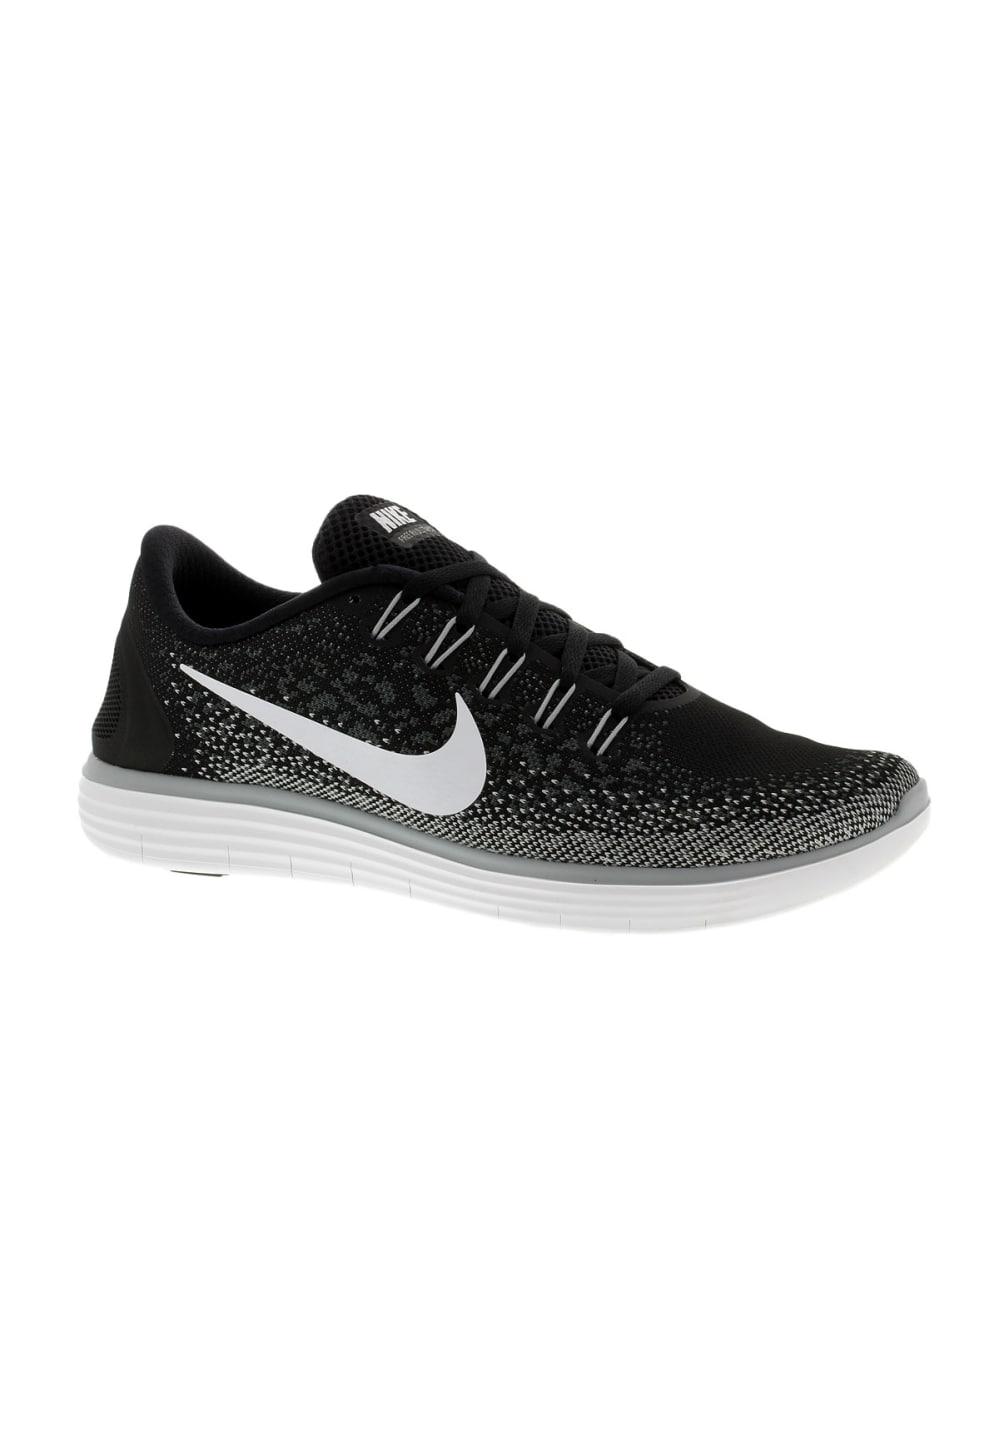 watch 94e87 81c9f Next. Nike. Free Run Distance - Chaussures running pour Femme